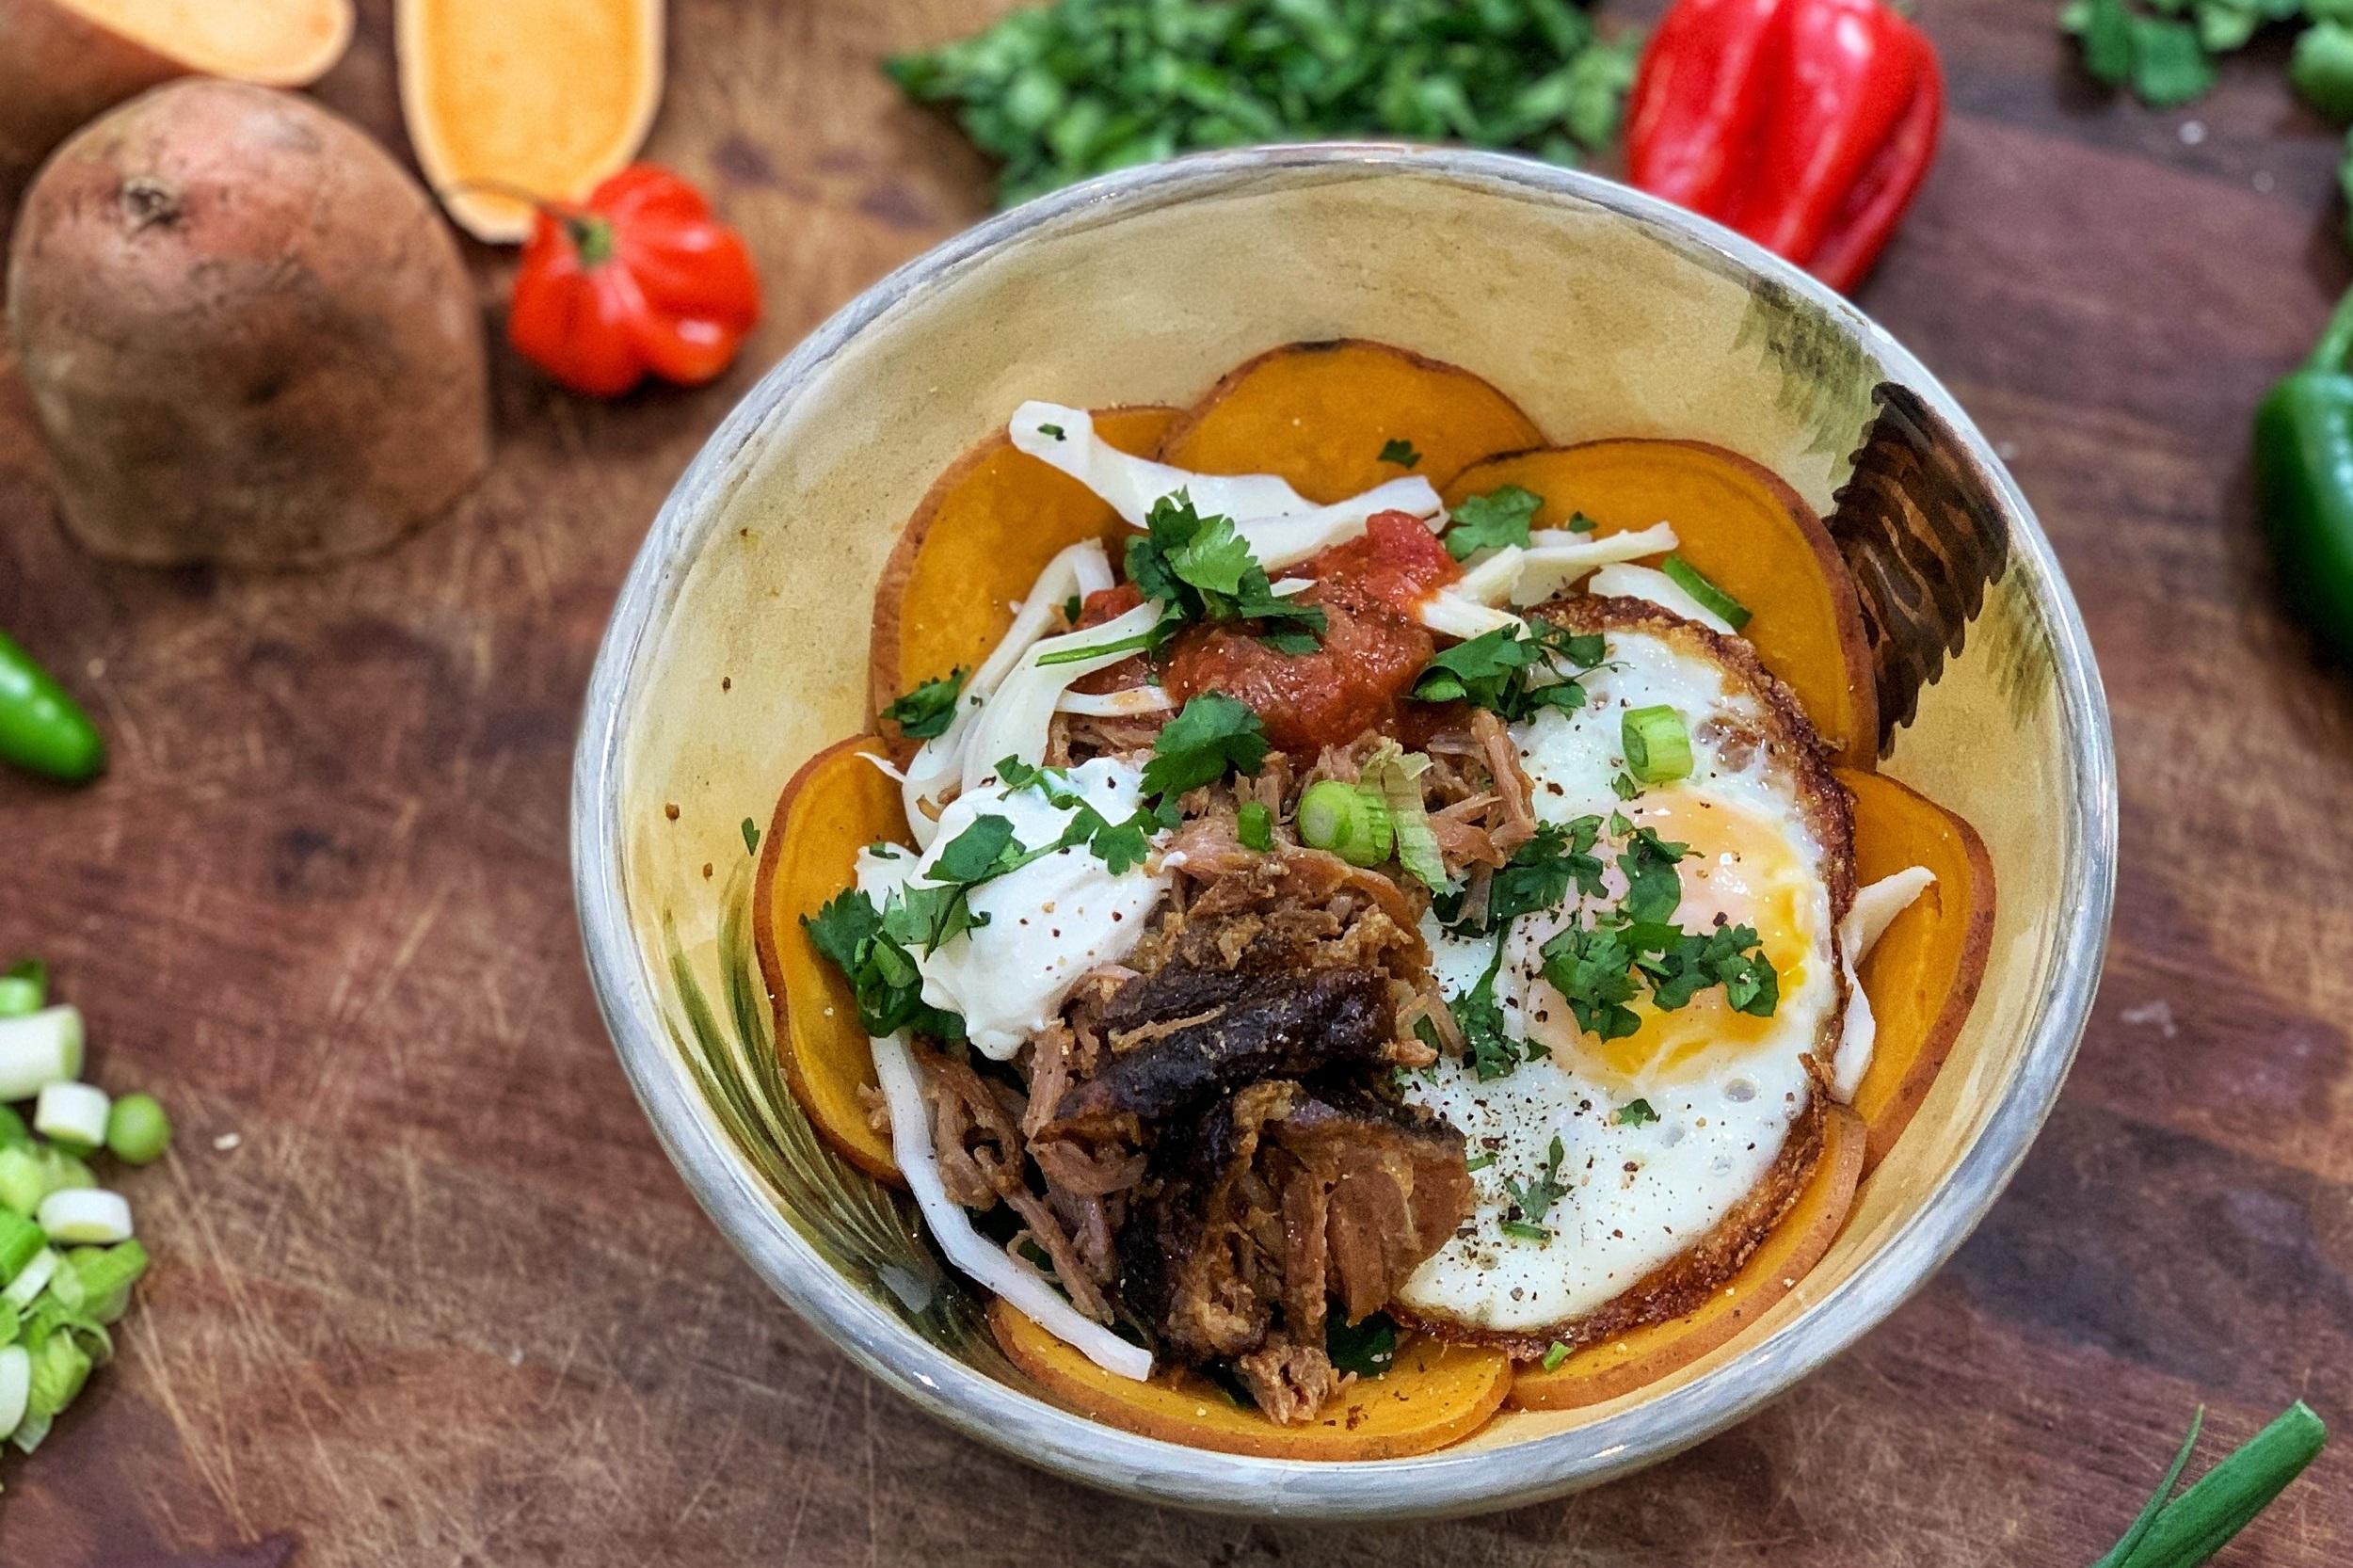 sweet-potato-and-carnitas-breakfast-nachos-HF.jpg